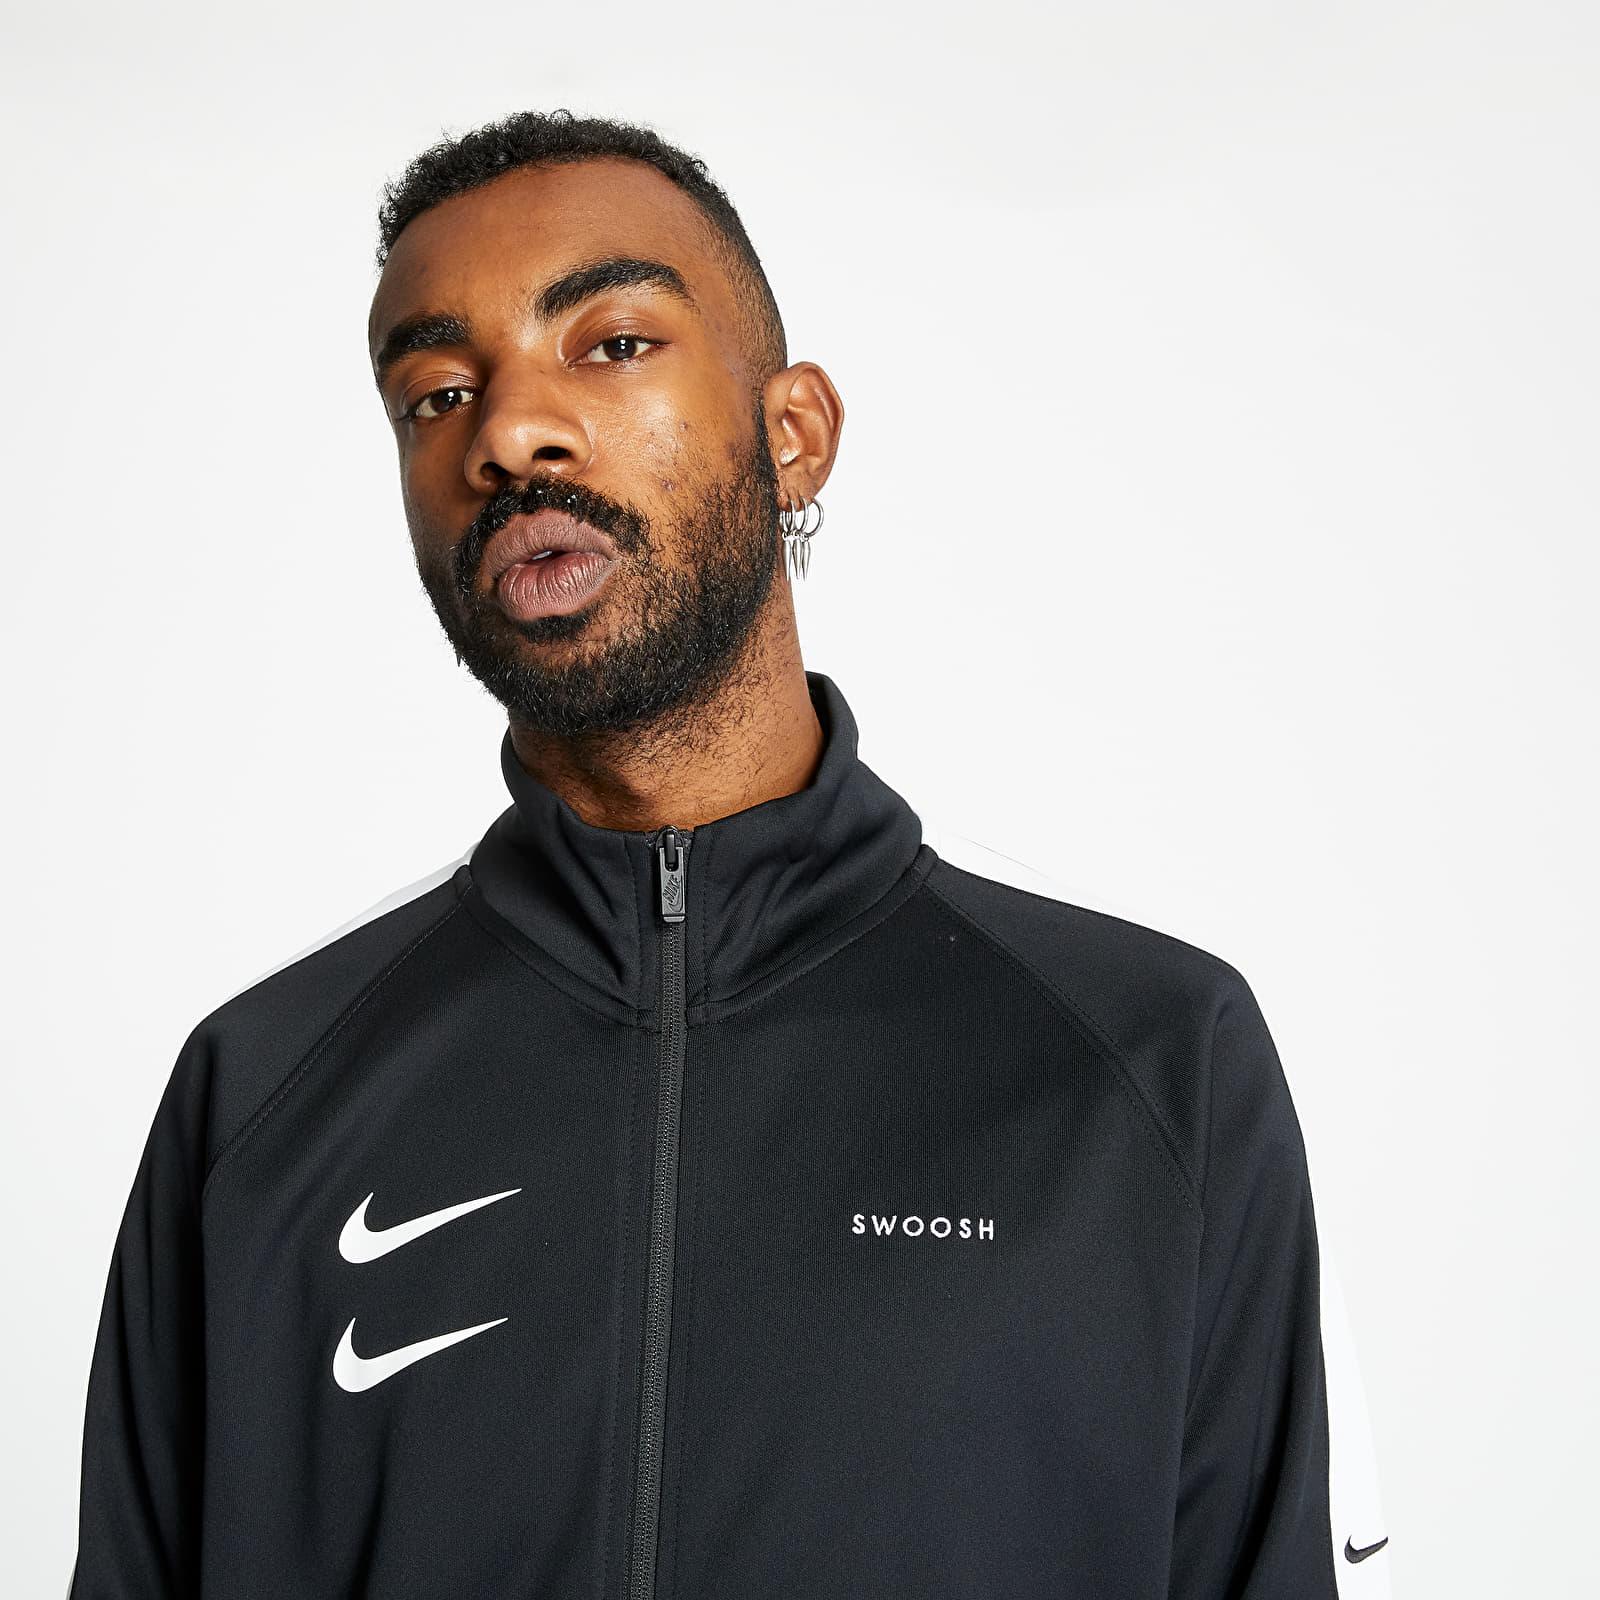 Nike Sportswear Swoosh Jacket Black/ White/ Black/ White EUR